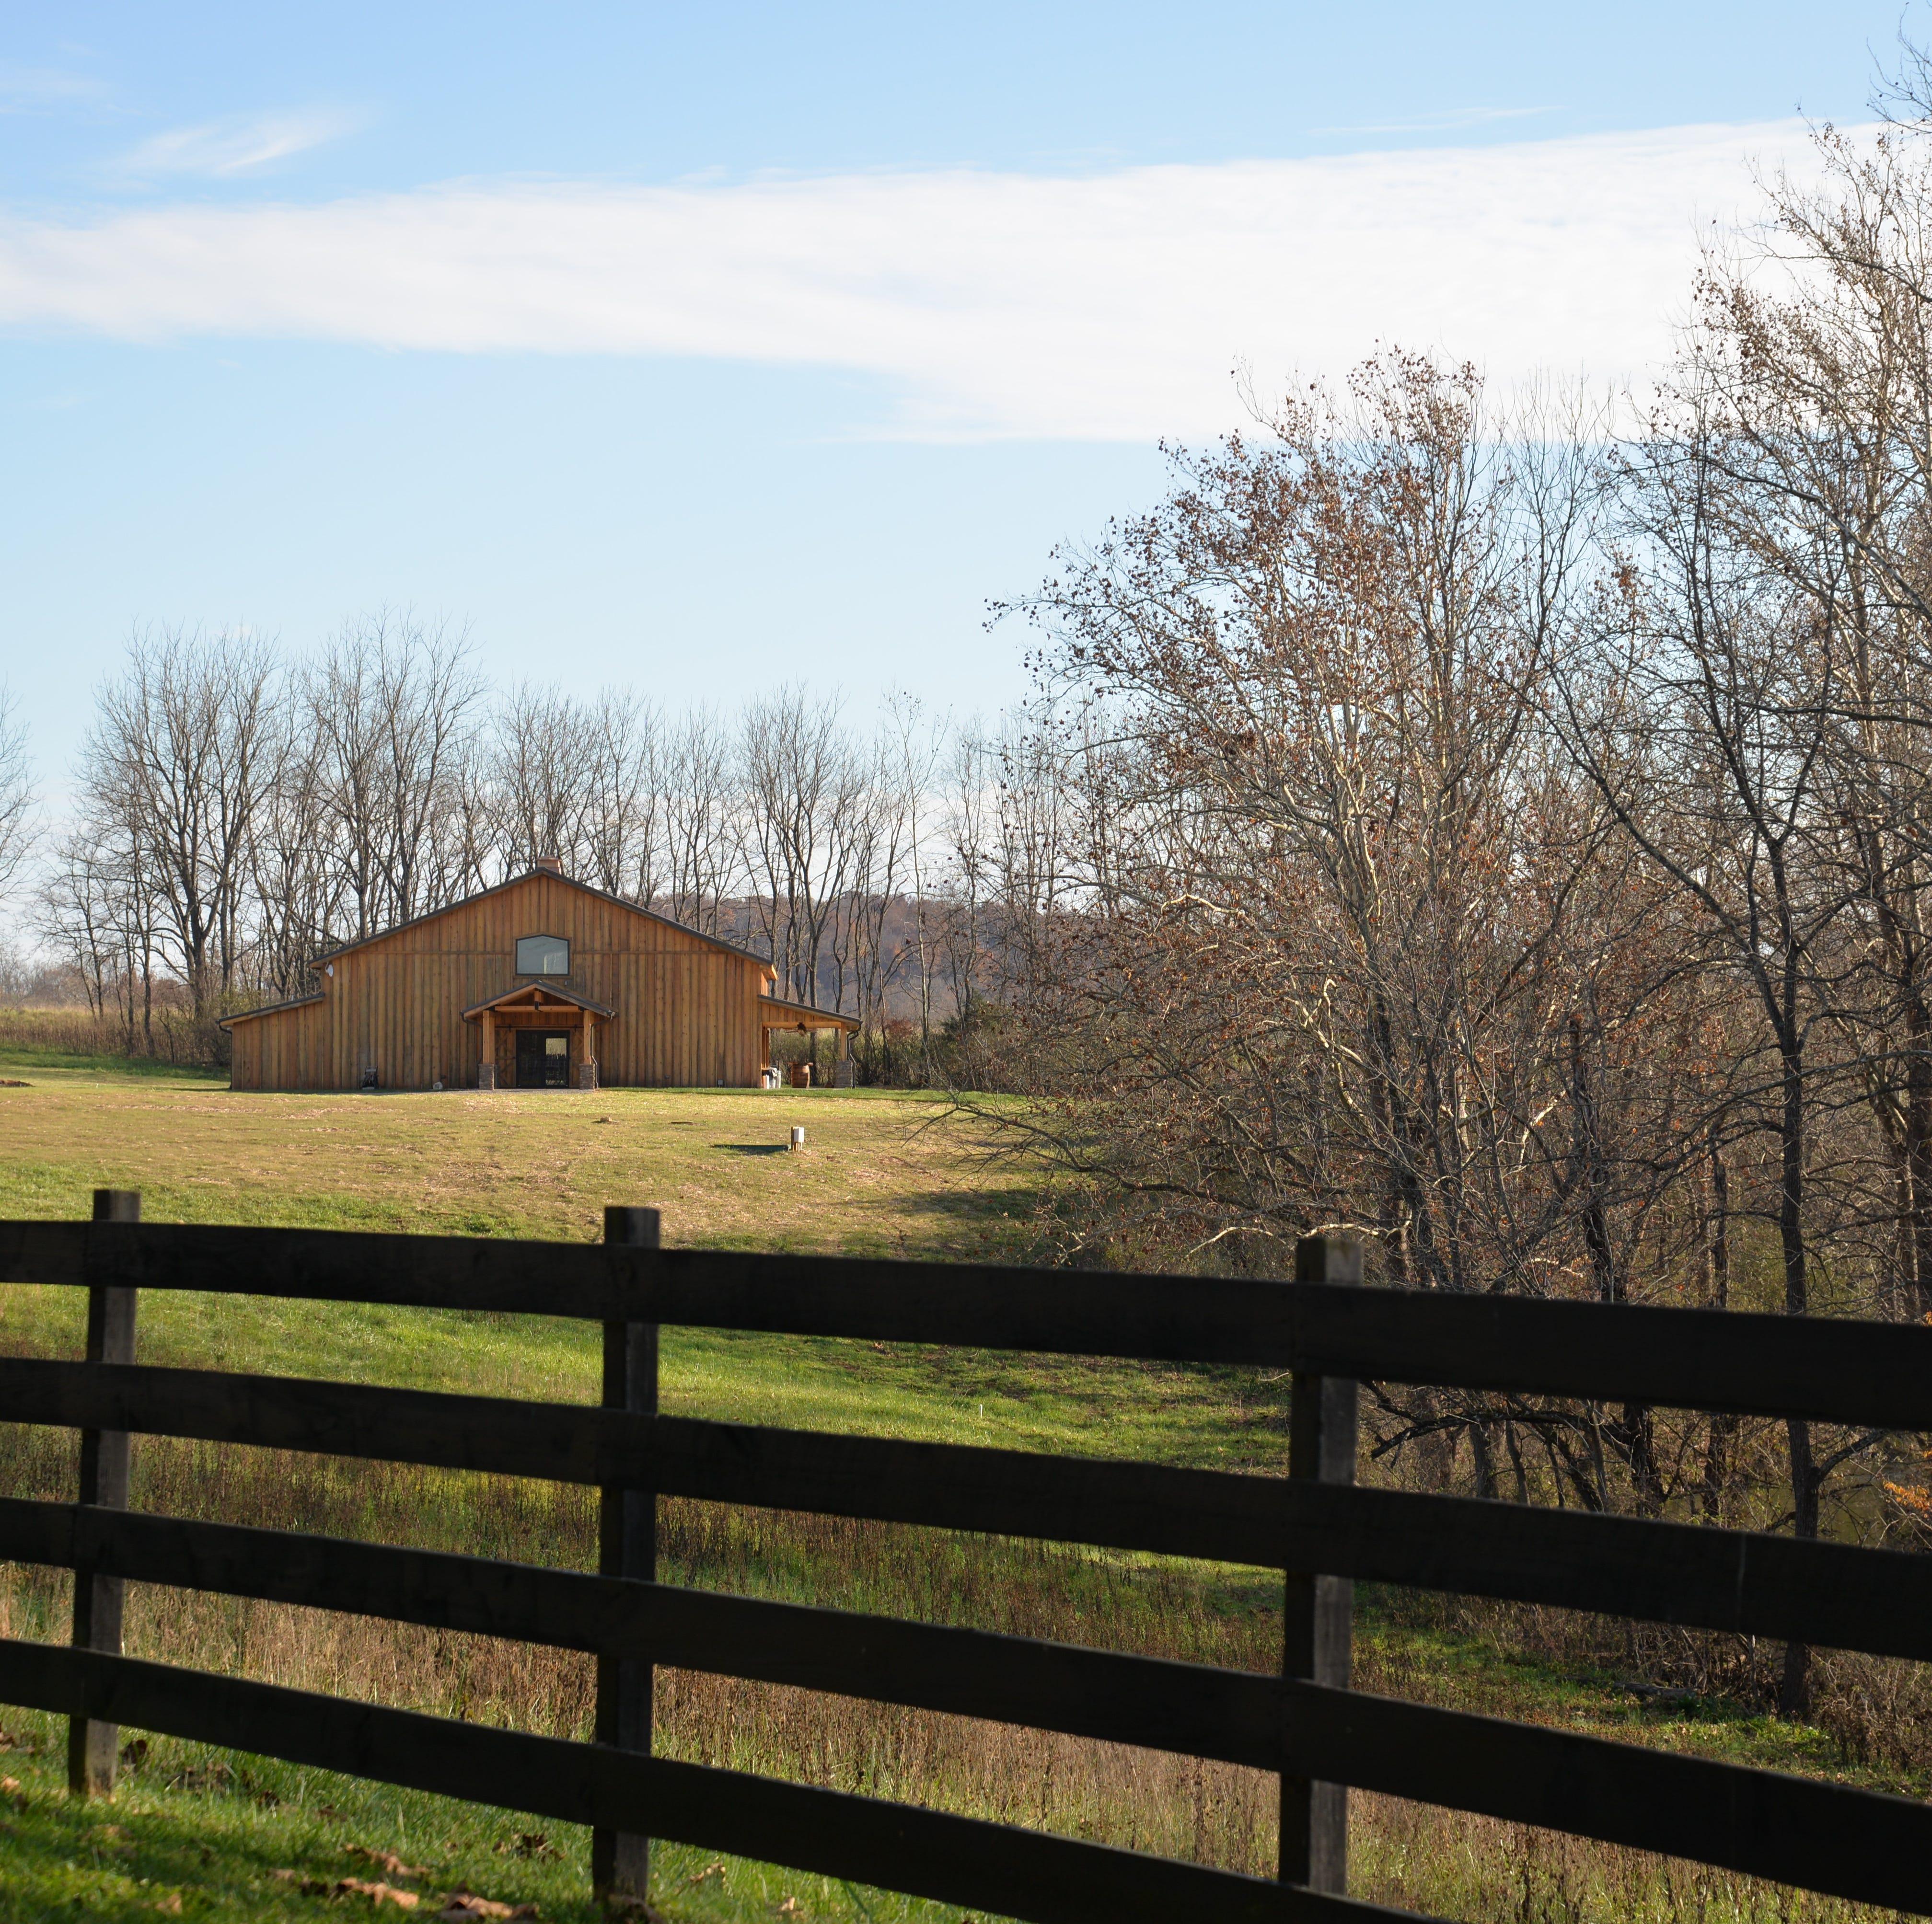 New barn wedding venue opens in Swoope